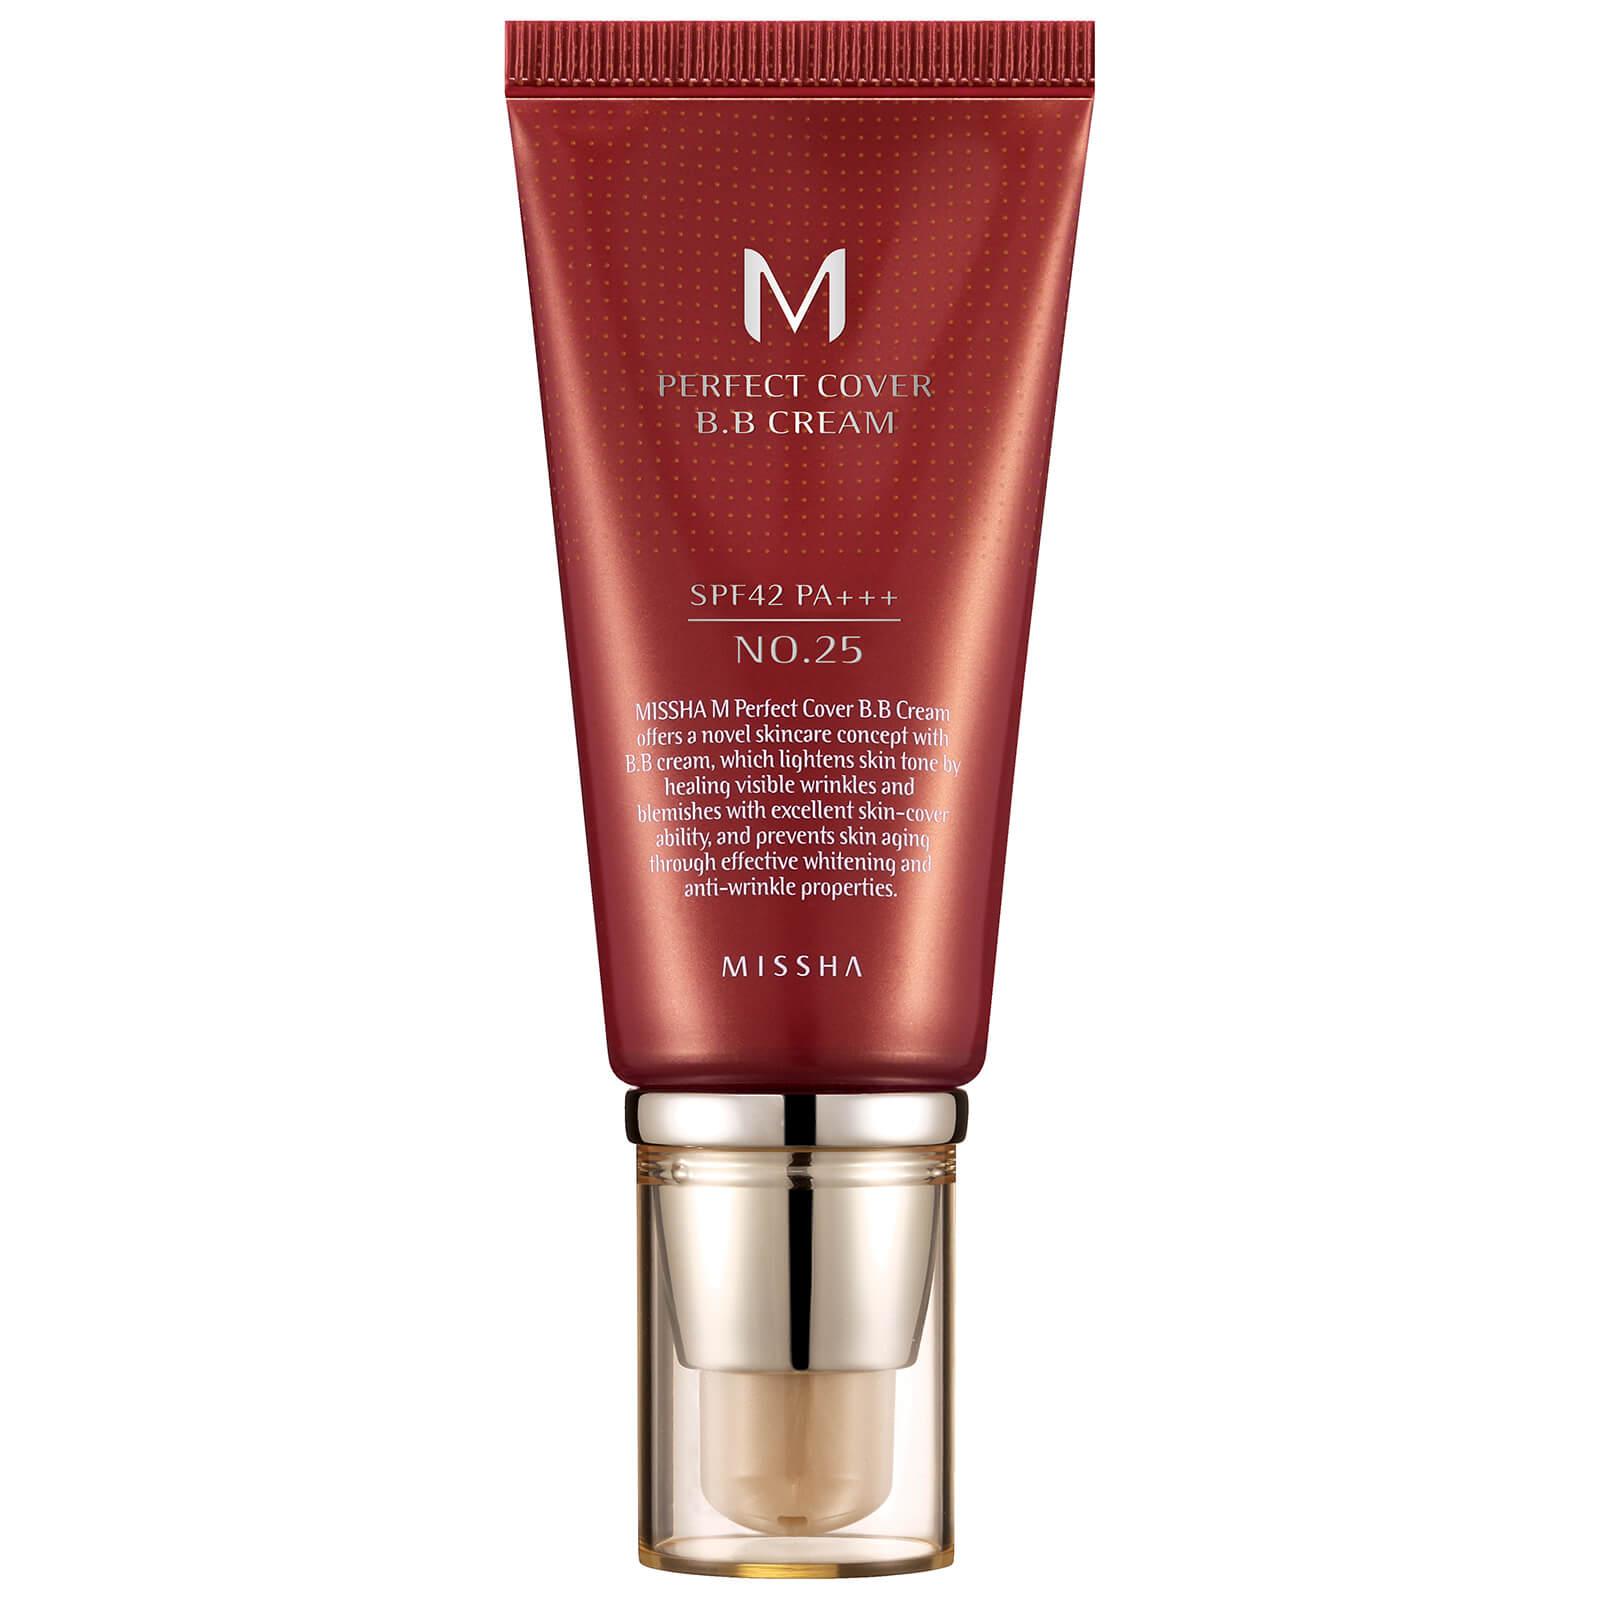 MISSHA M Perfect Cover BB Cream SPF42/PA+++ - No.25/Warm Beige 50ml